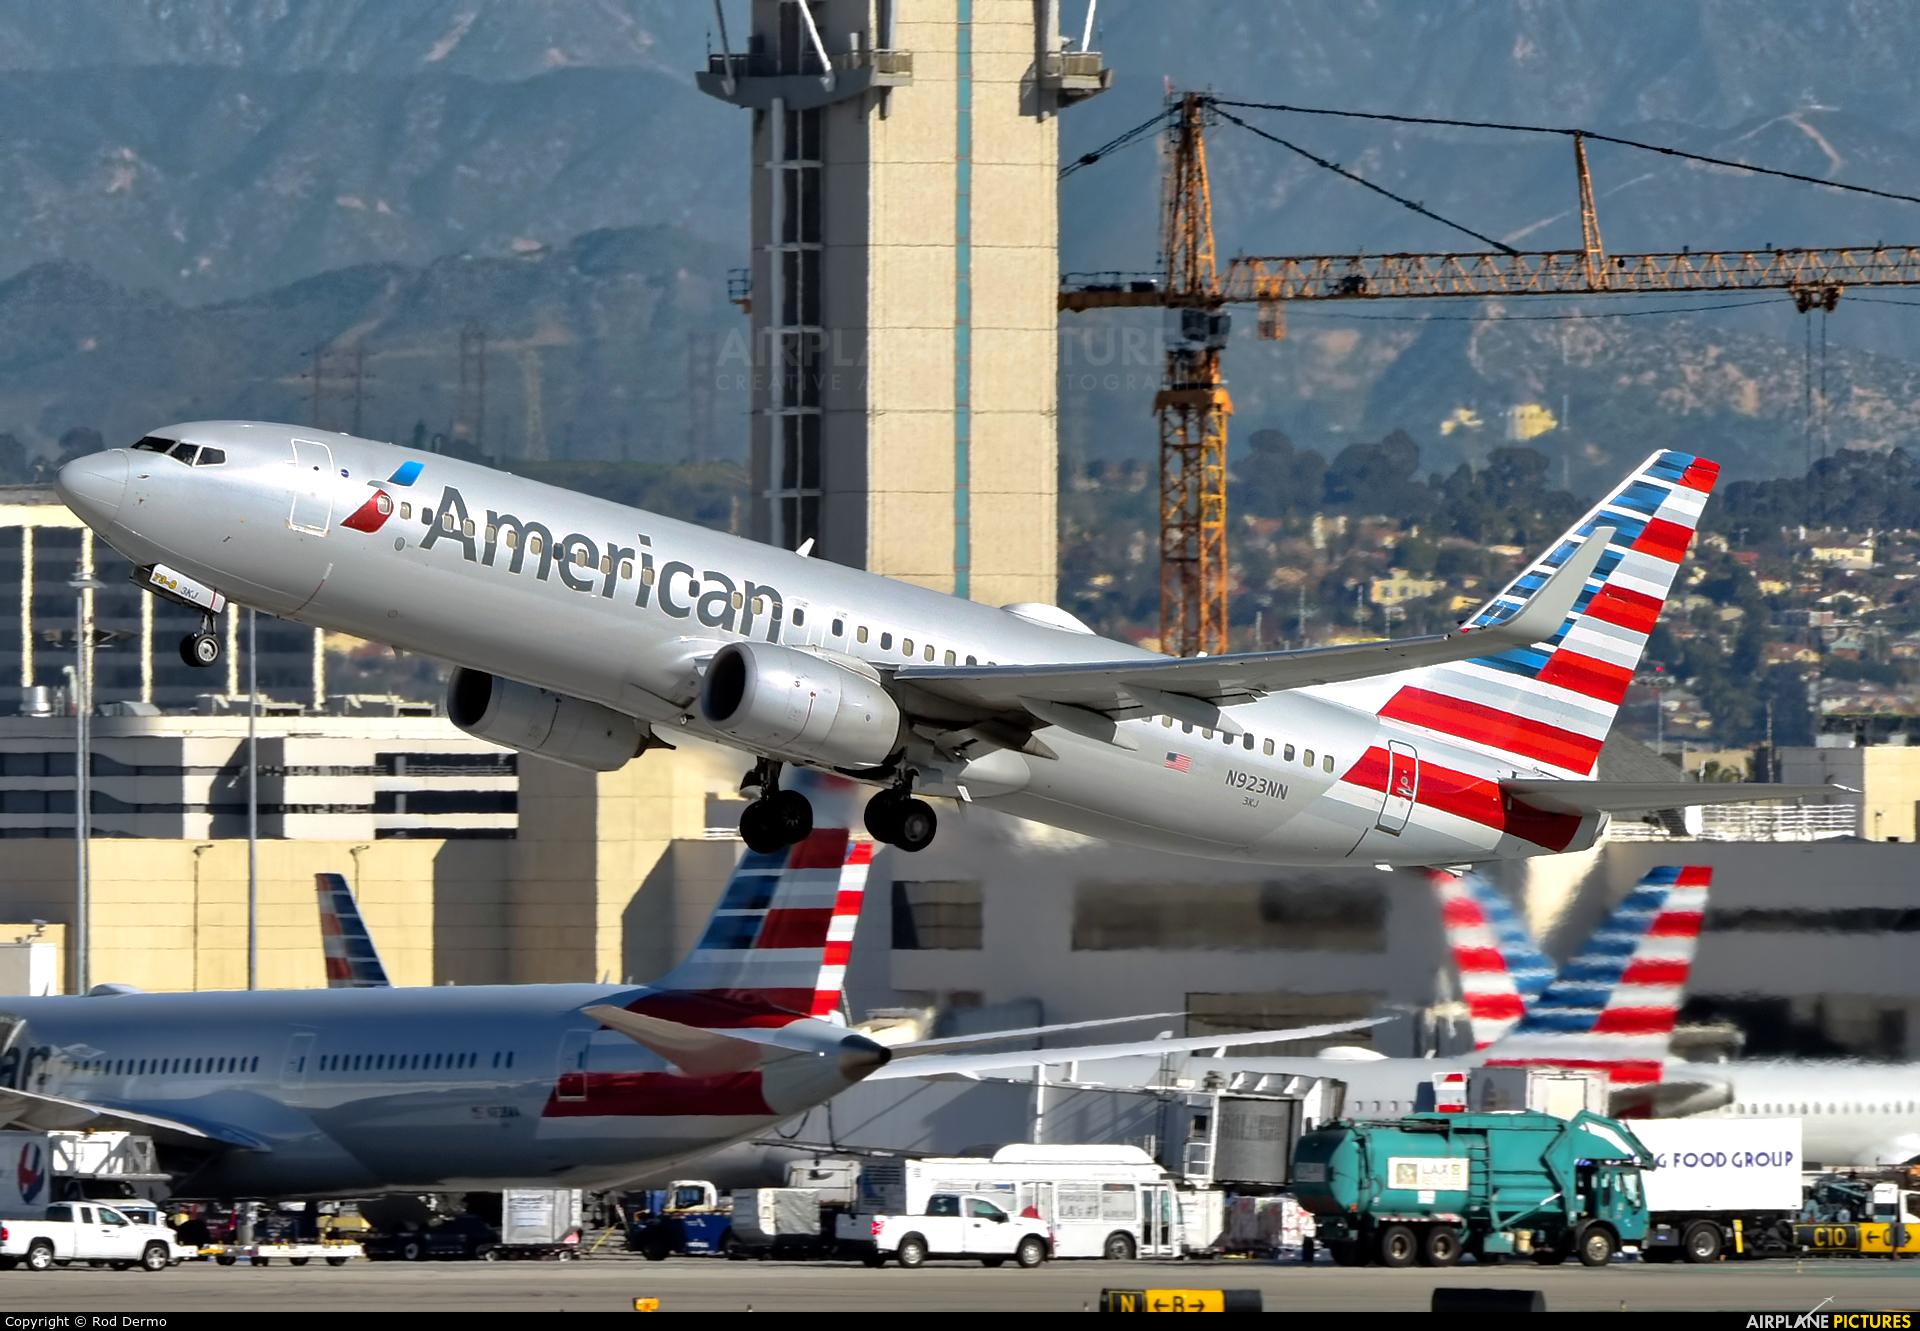 American Airlines N923NN aircraft at Los Angeles Intl